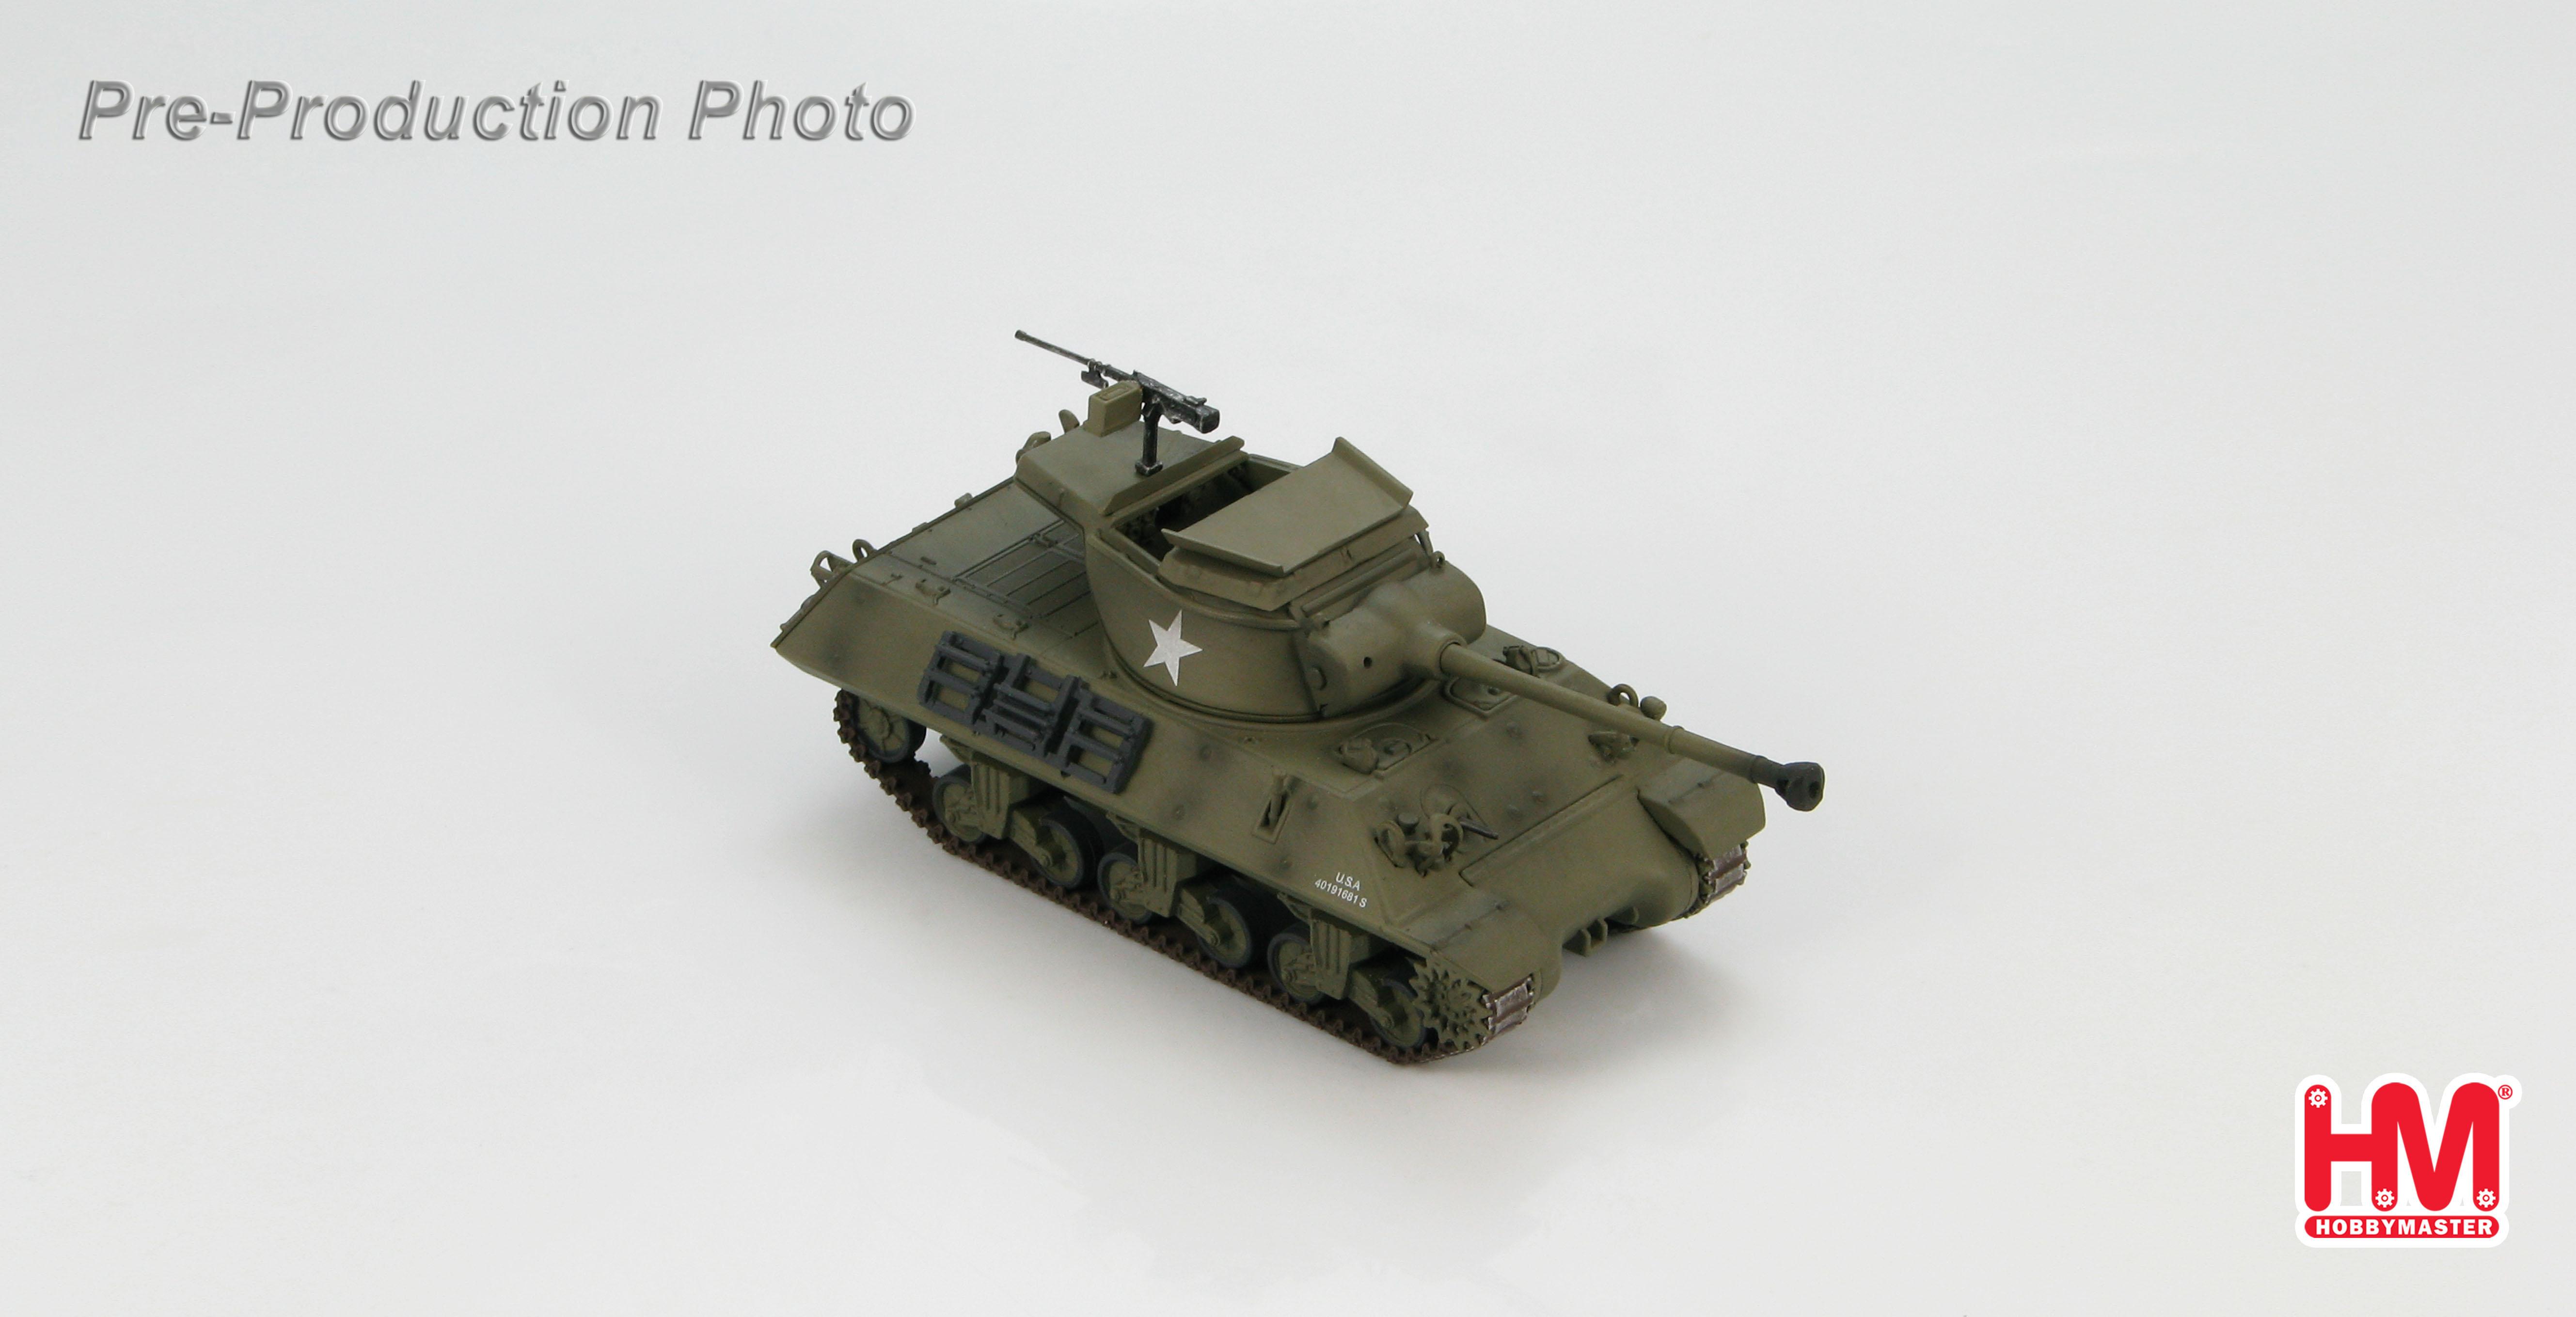 HG5403 Hobbymaster US M36 Jackson Gmc Tank Destroyer Korean War